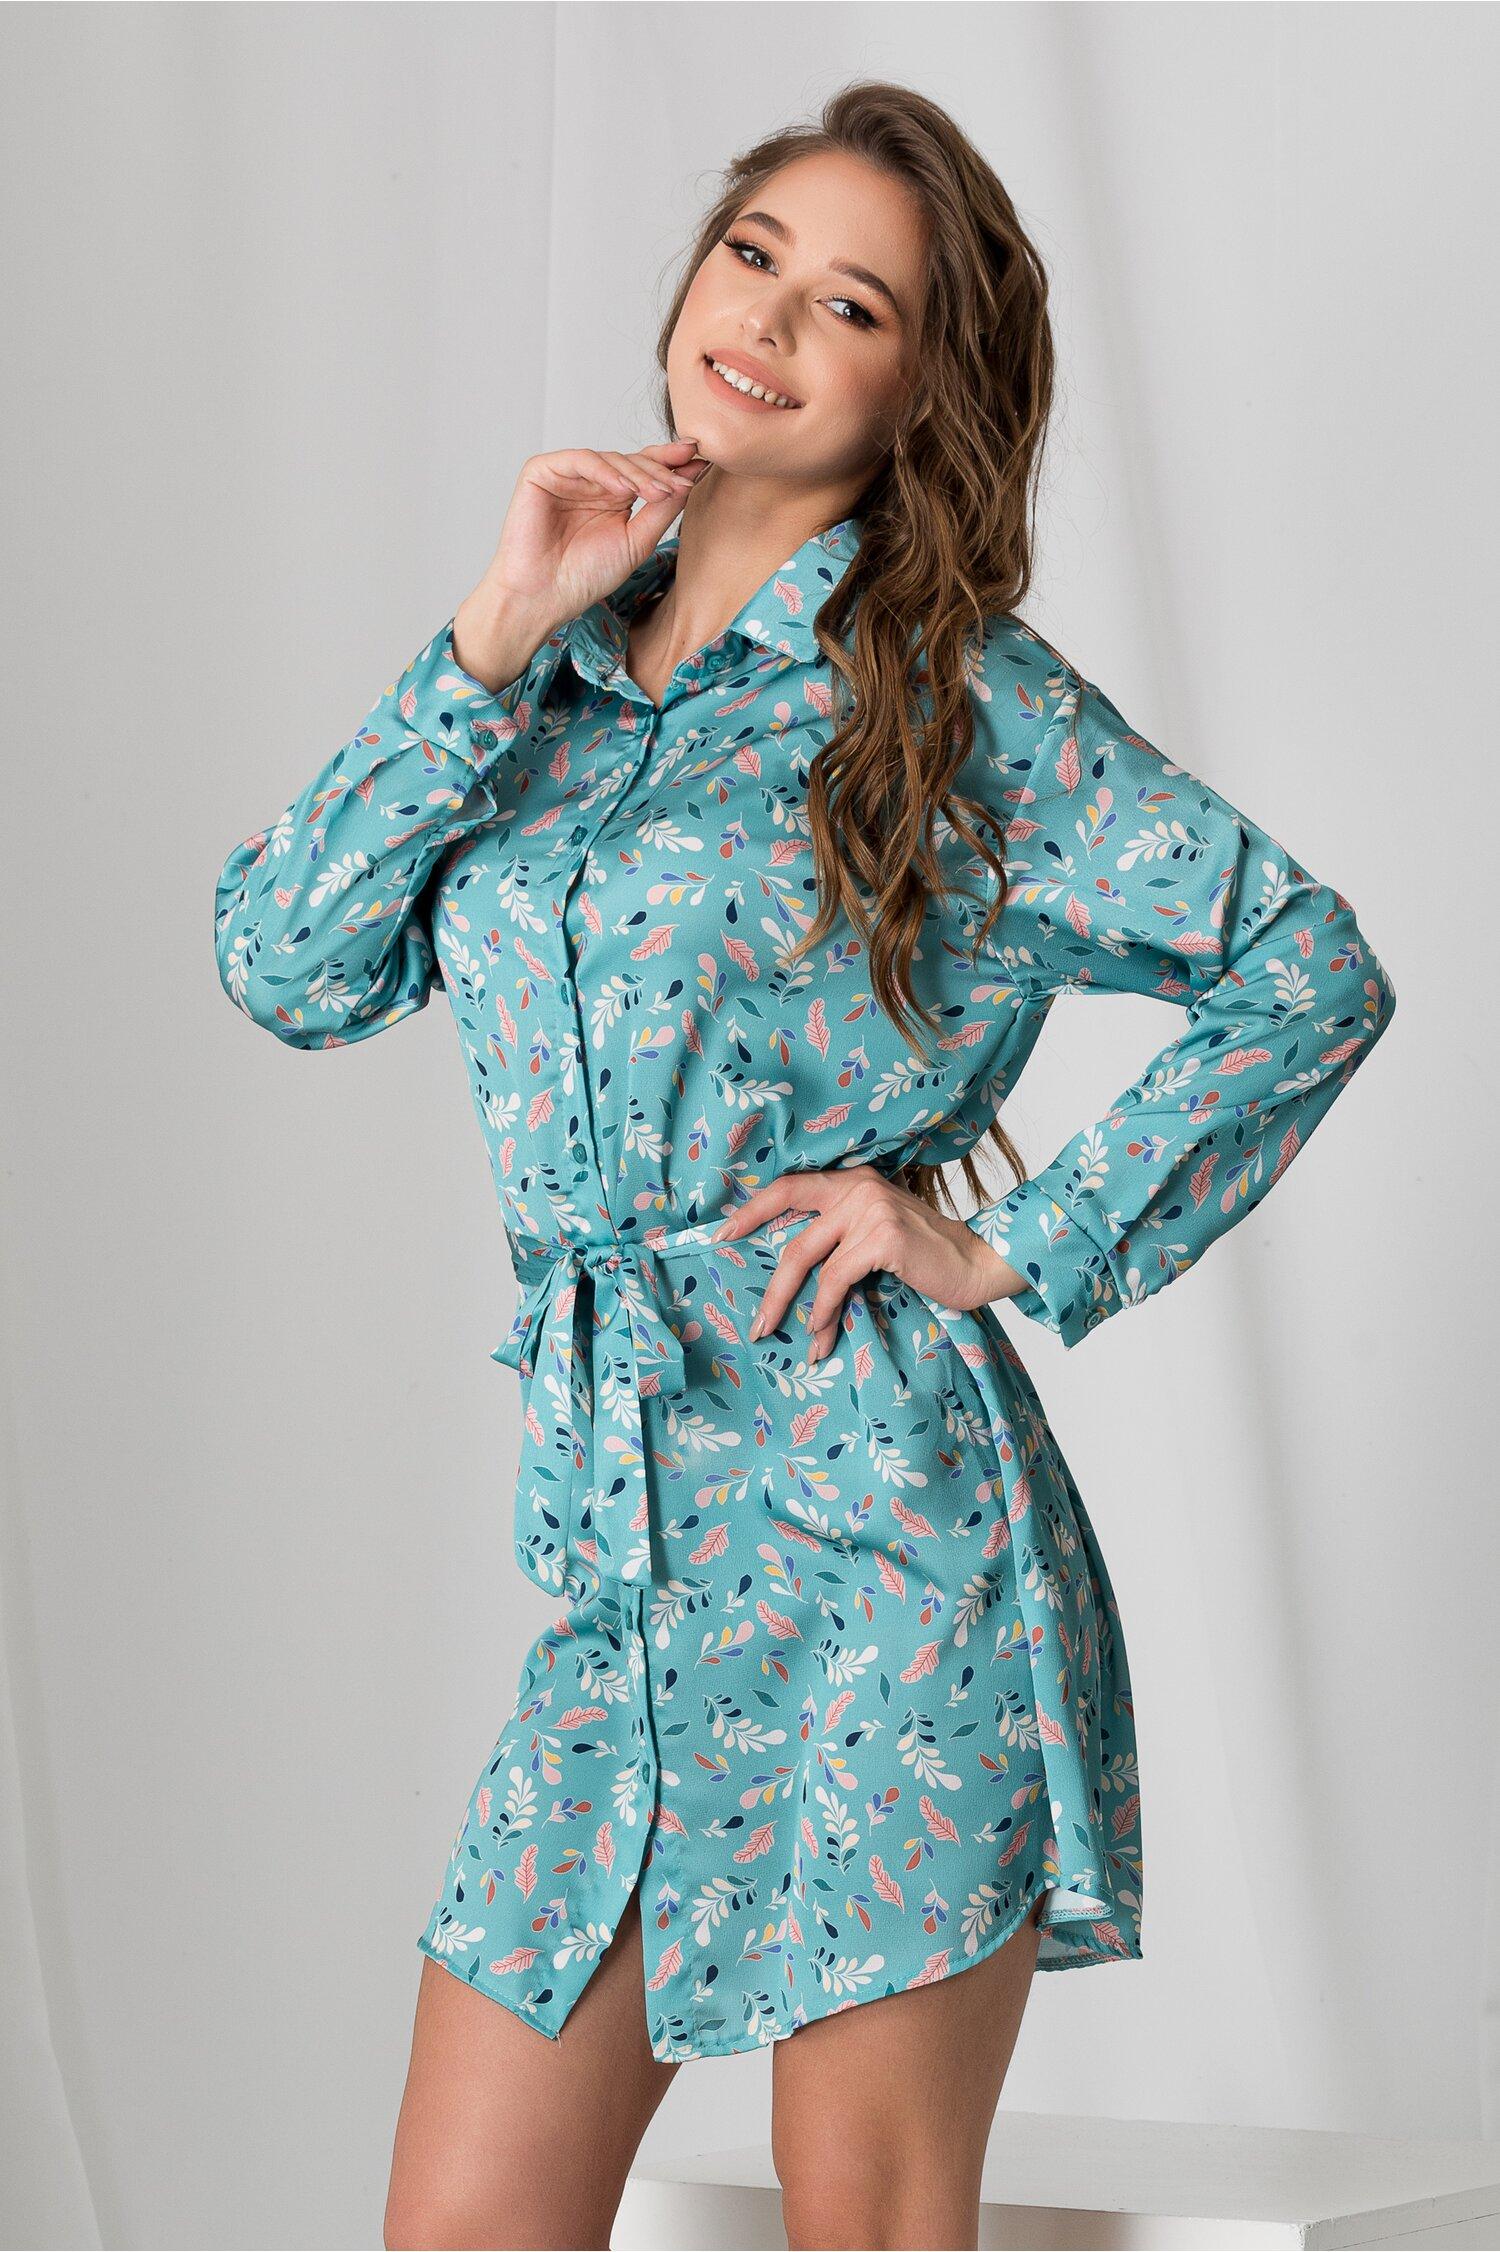 Rochie Alma tip camasa turcoaz cu imprimeuri colorate